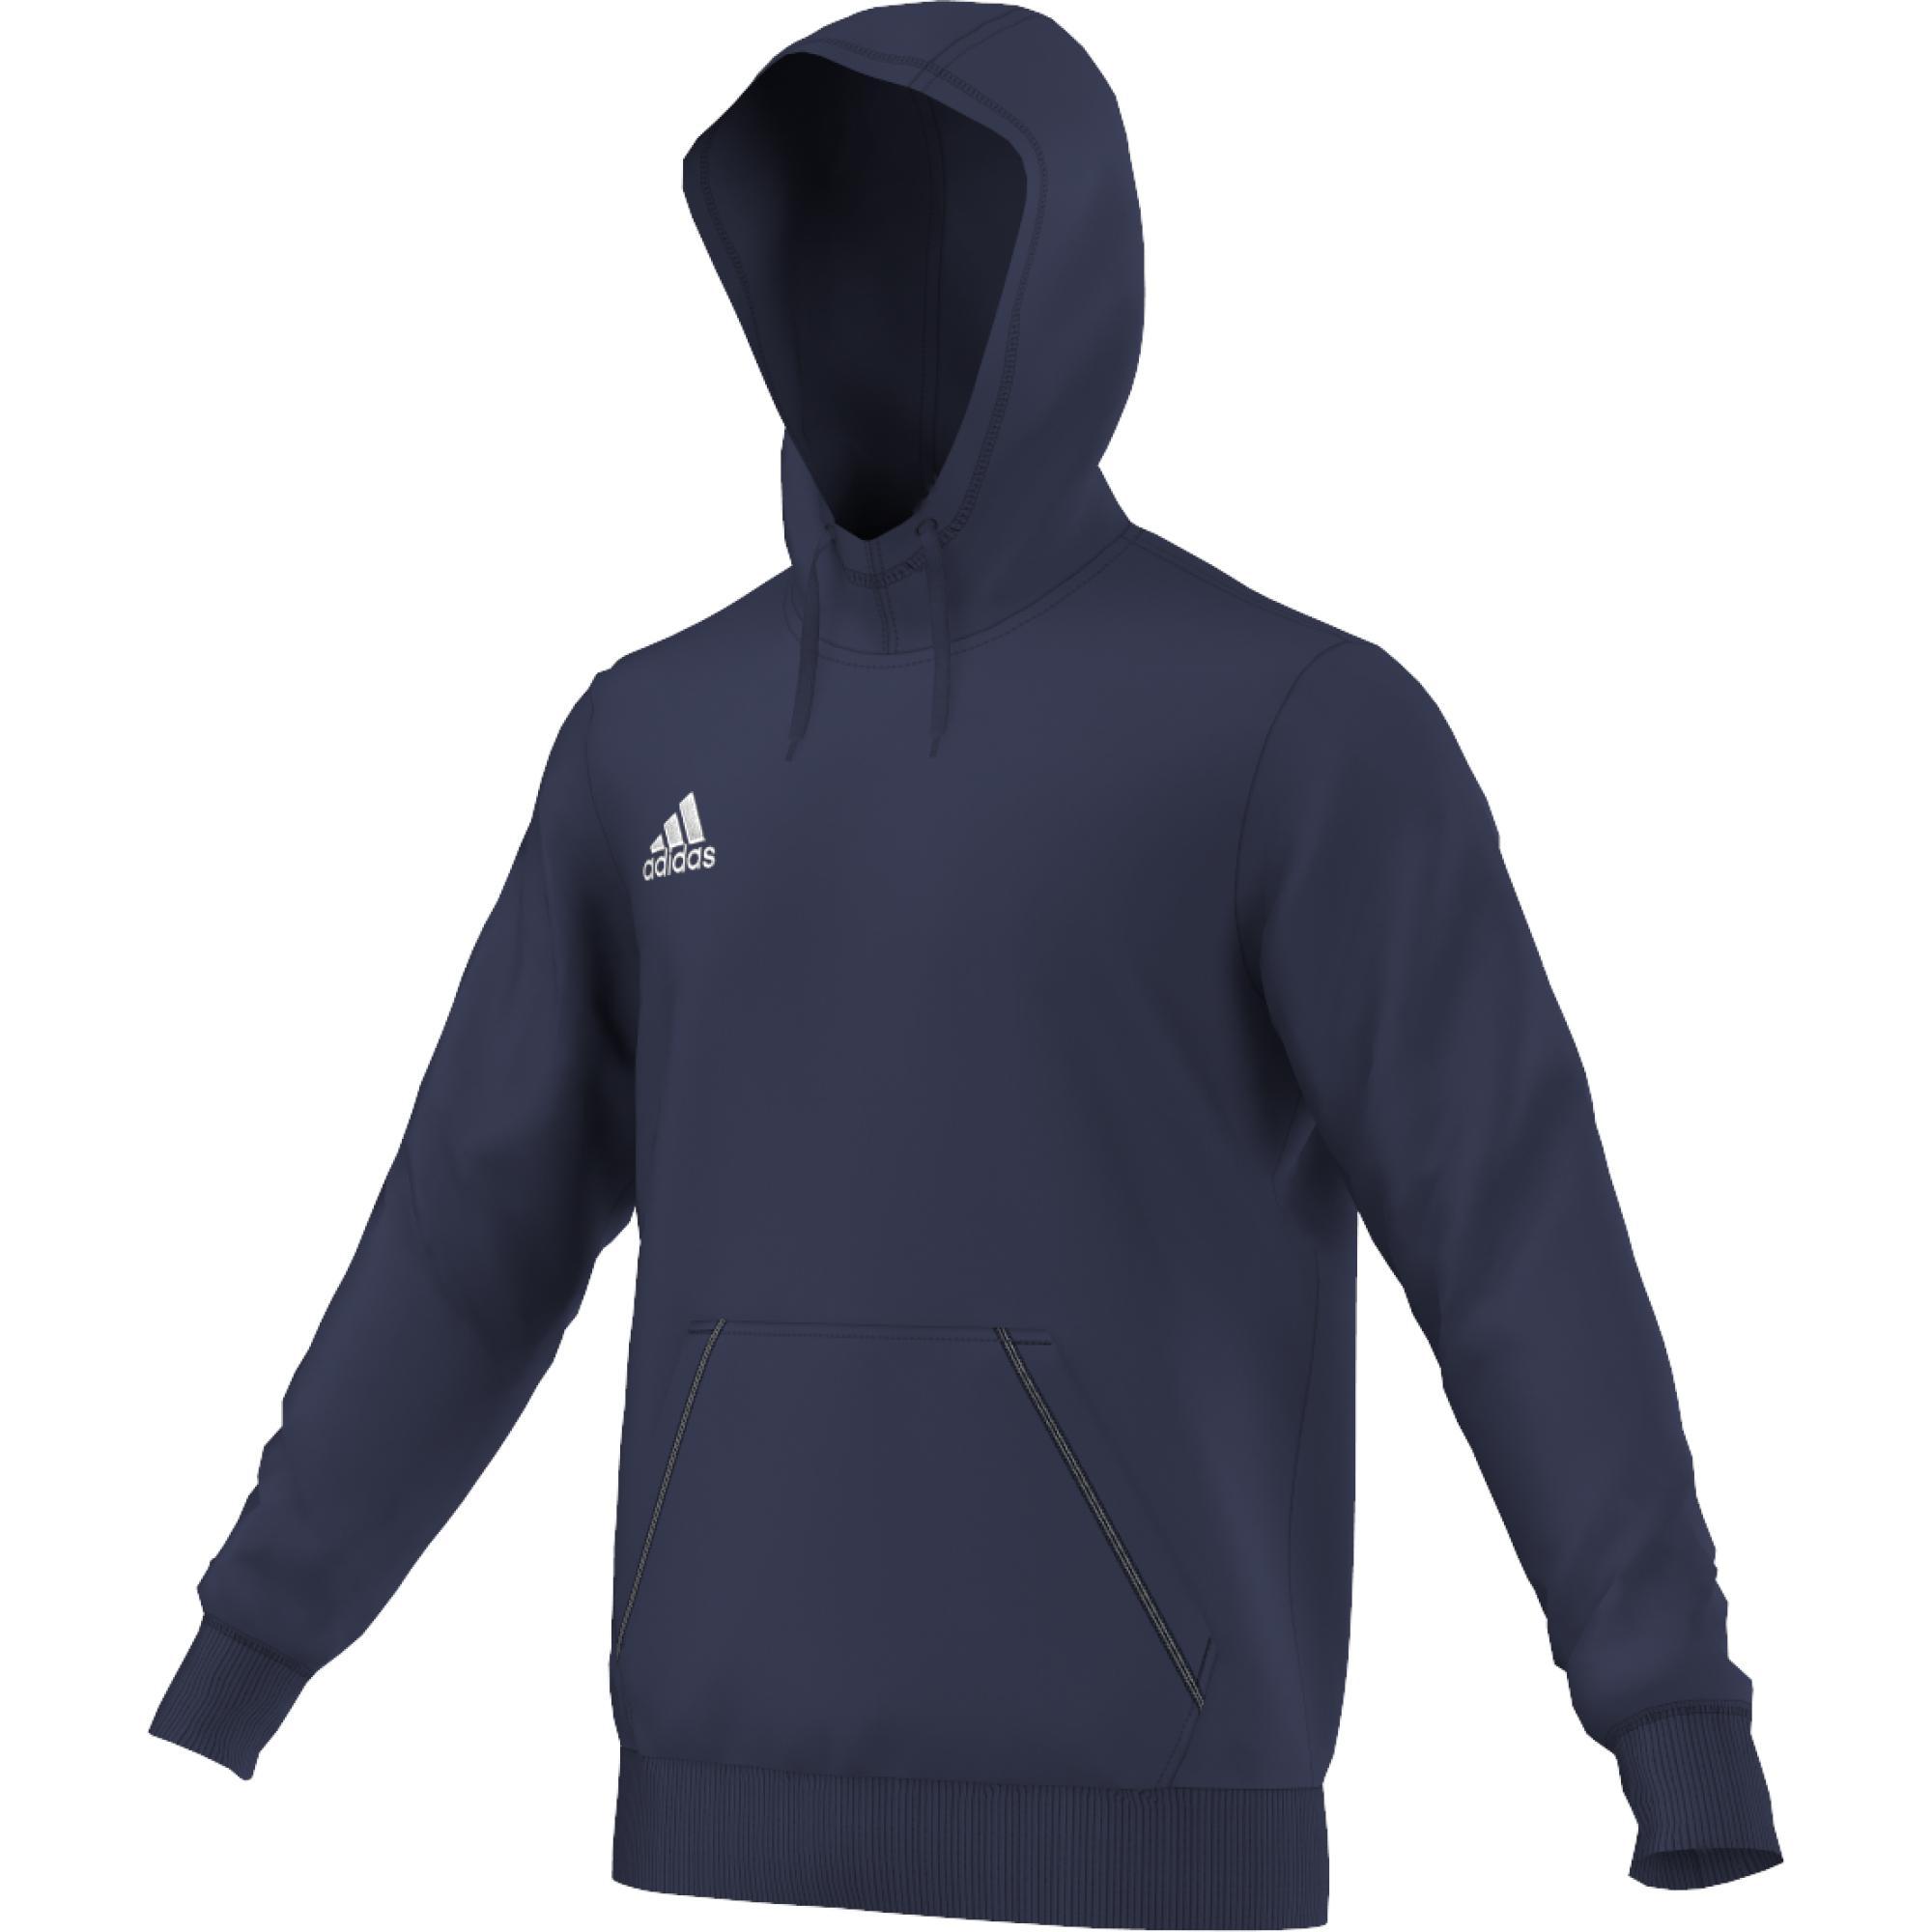 Adidas Mikina Coref HOODY dětská Barva: Modrá, Velikost: 140